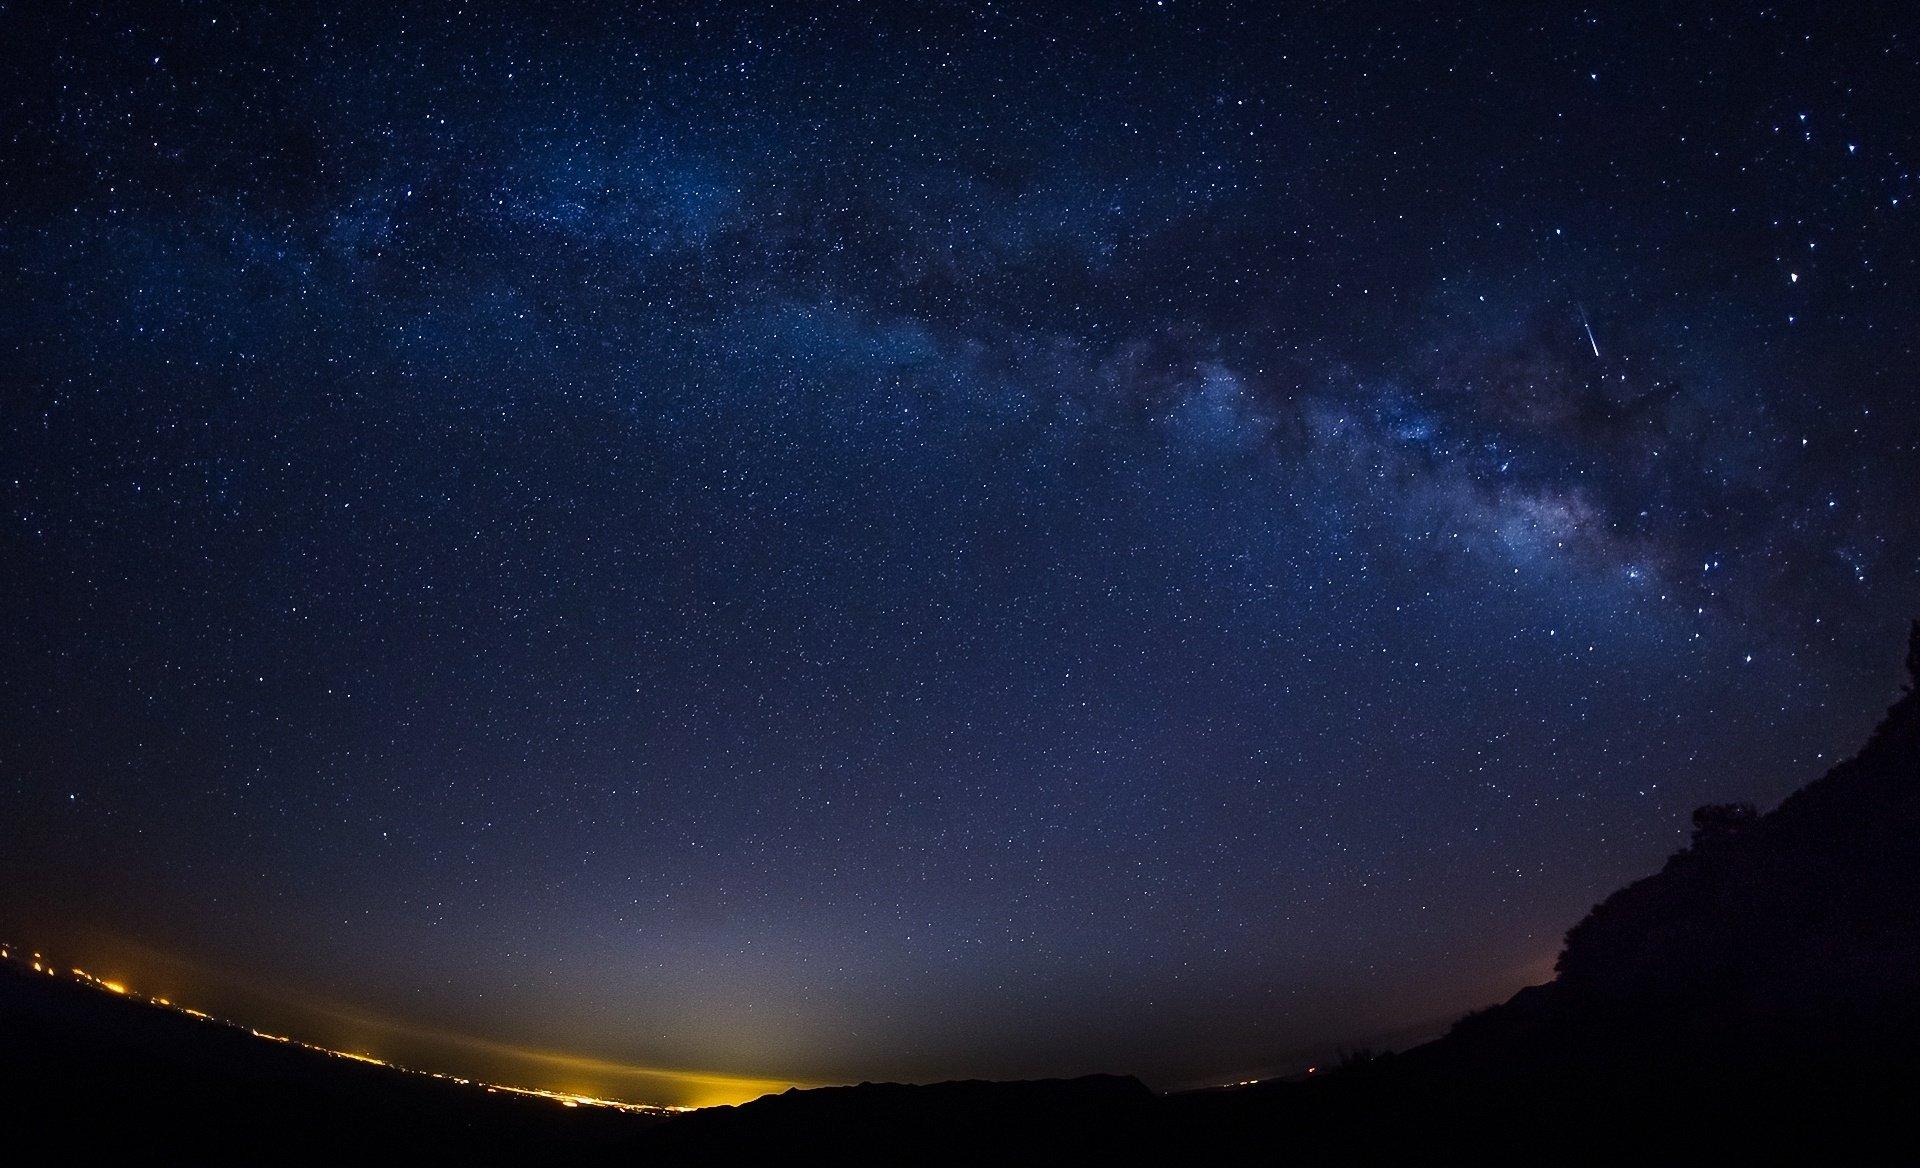 starry sky wallpaper 27475